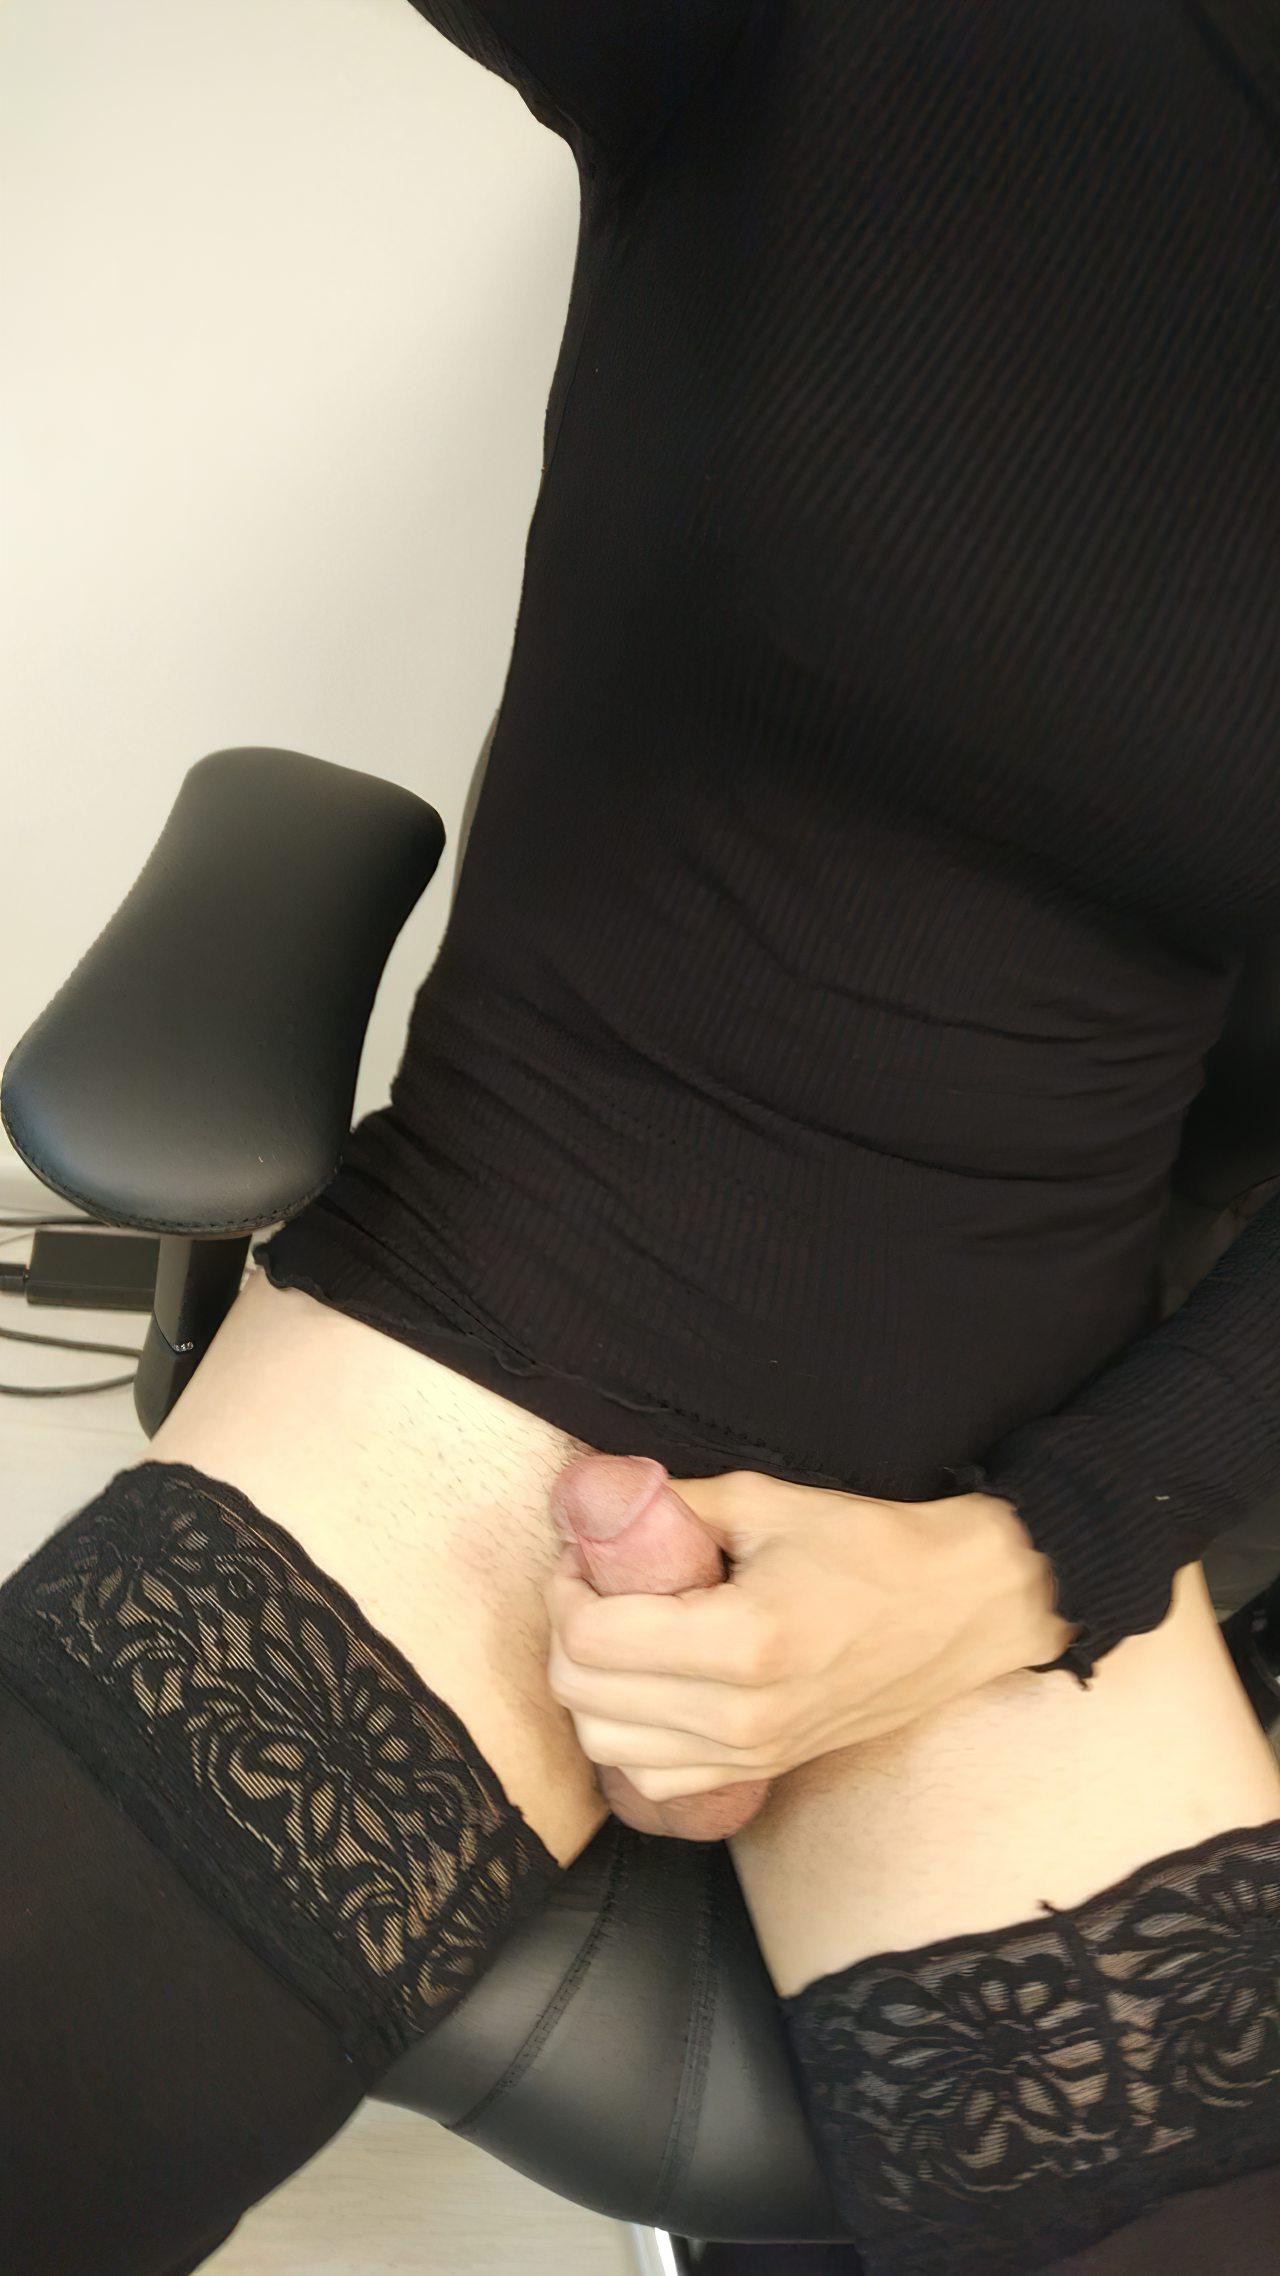 Secretaria Travesti Peluda (9)